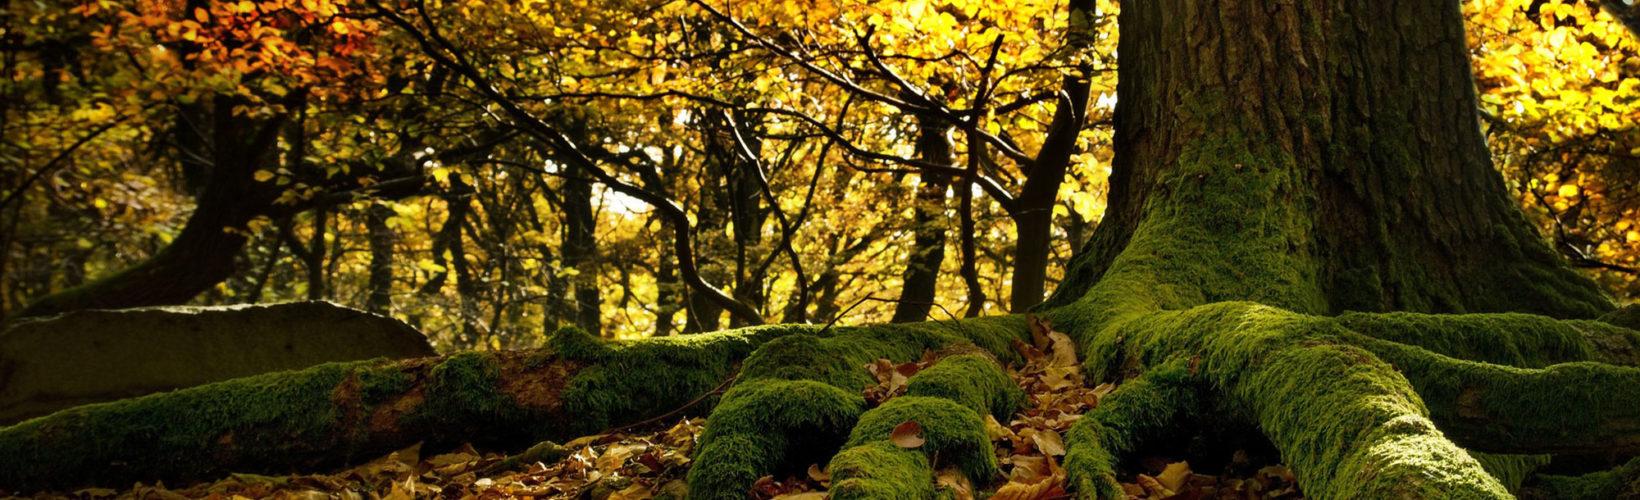 Åkulla beech forest